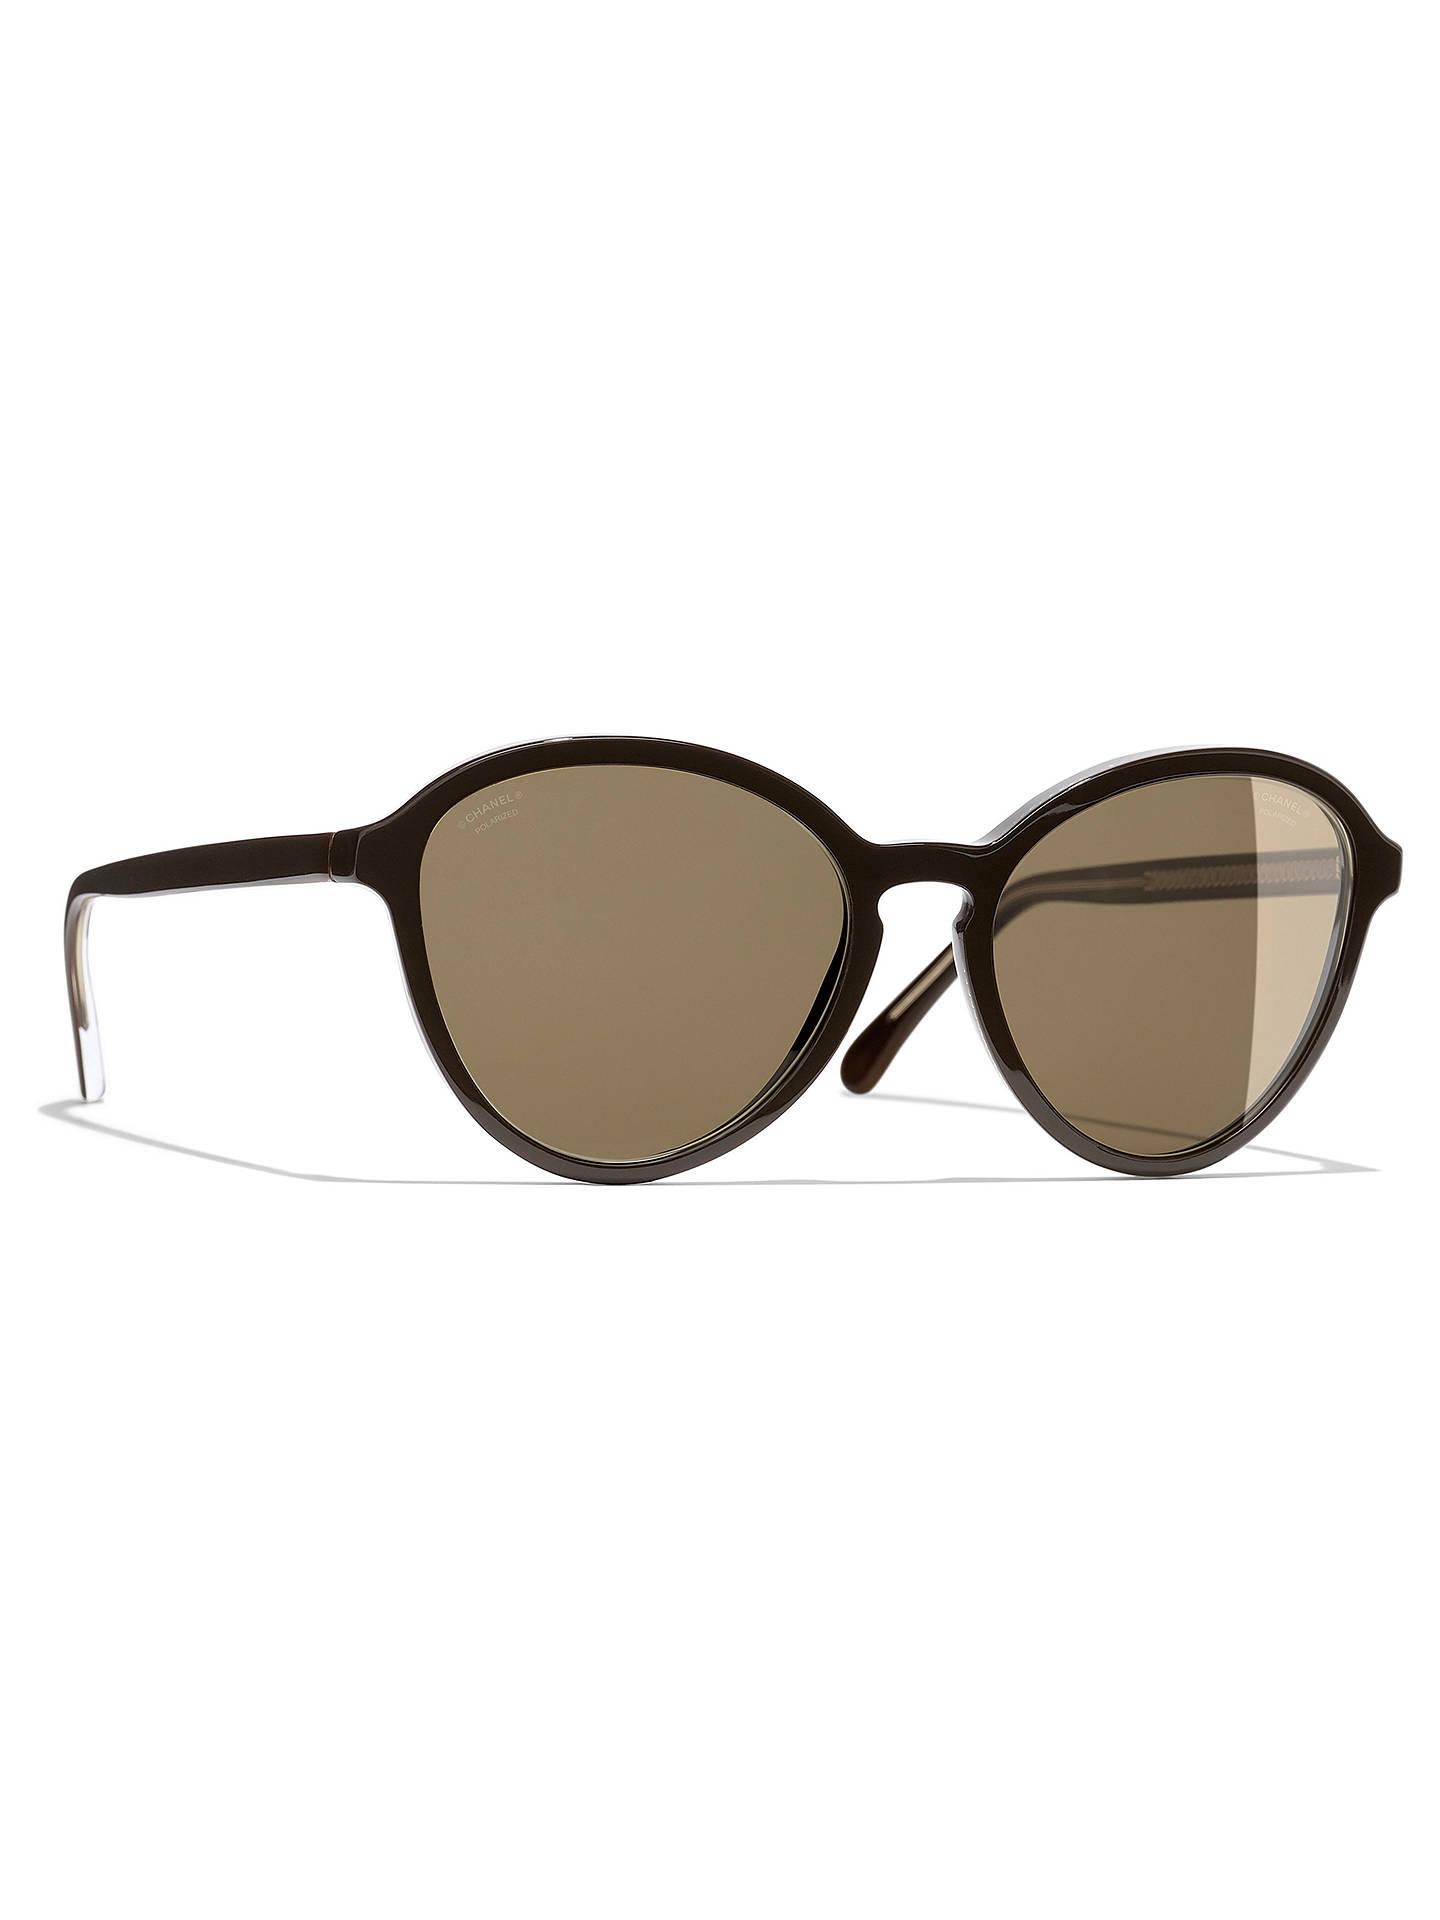 e41c4a7d7c2b Buy CHANEL Phantos Sunglasses CH5403 Brown Online at johnlewis.com ...